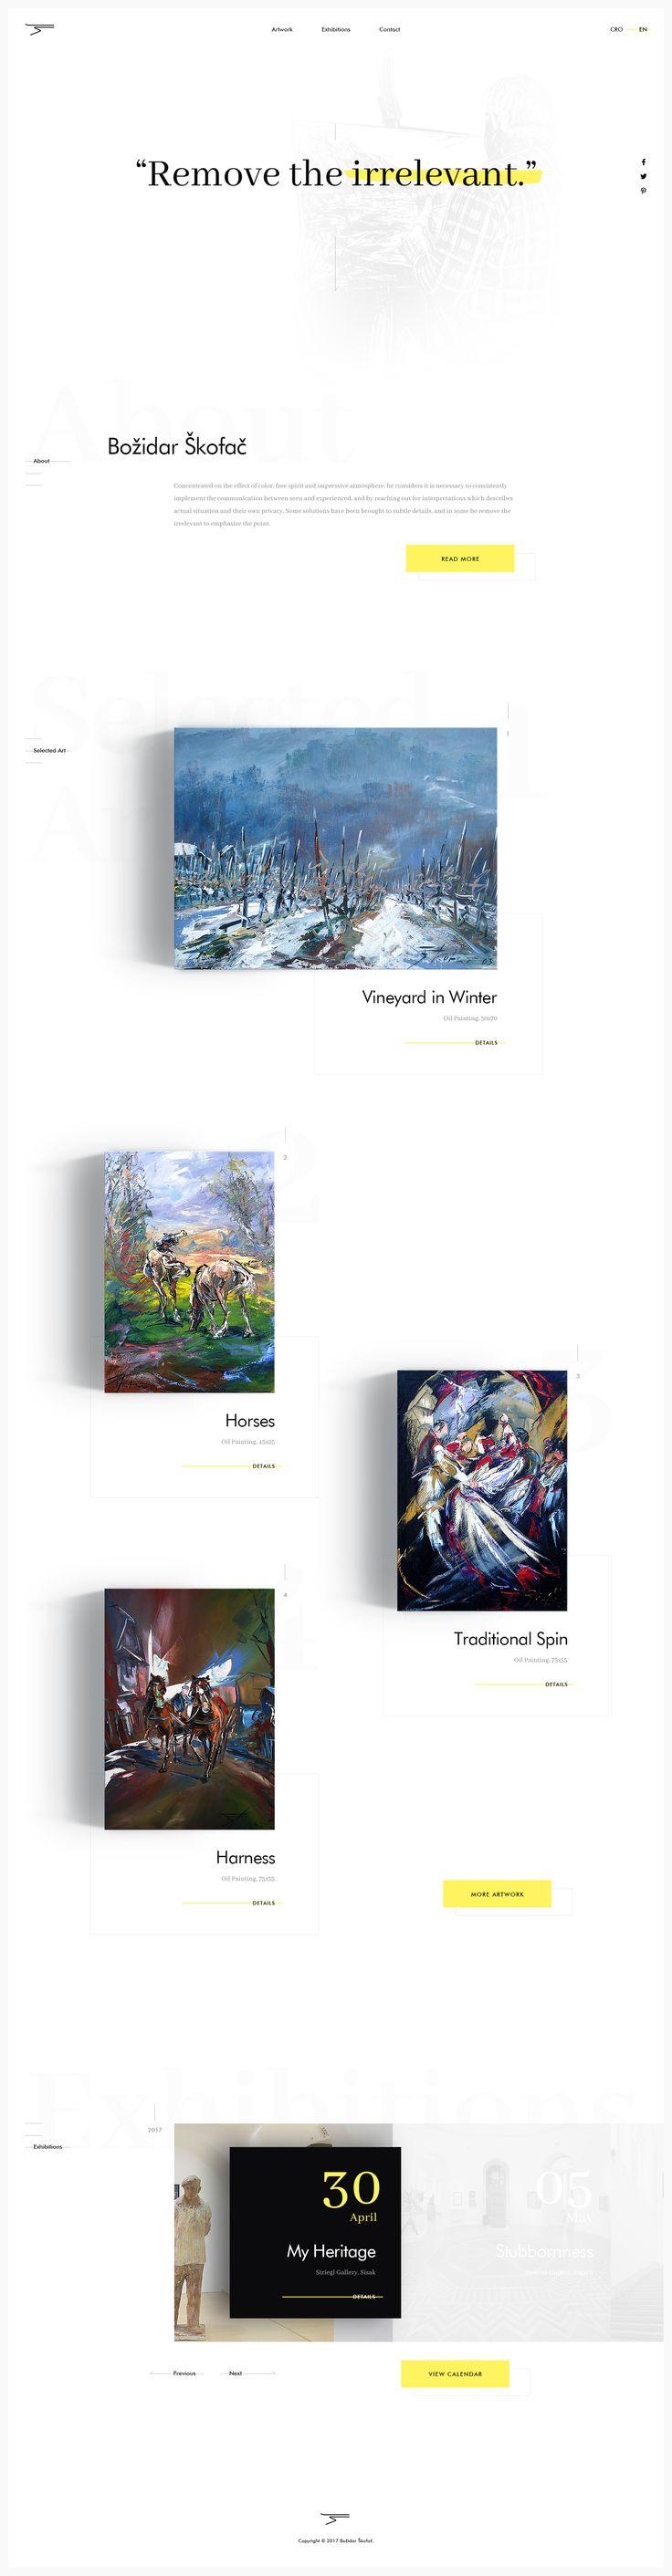 Skofac Artwok website. Ui design concept by CREATIVE Studio. (Interesting lightning angle)